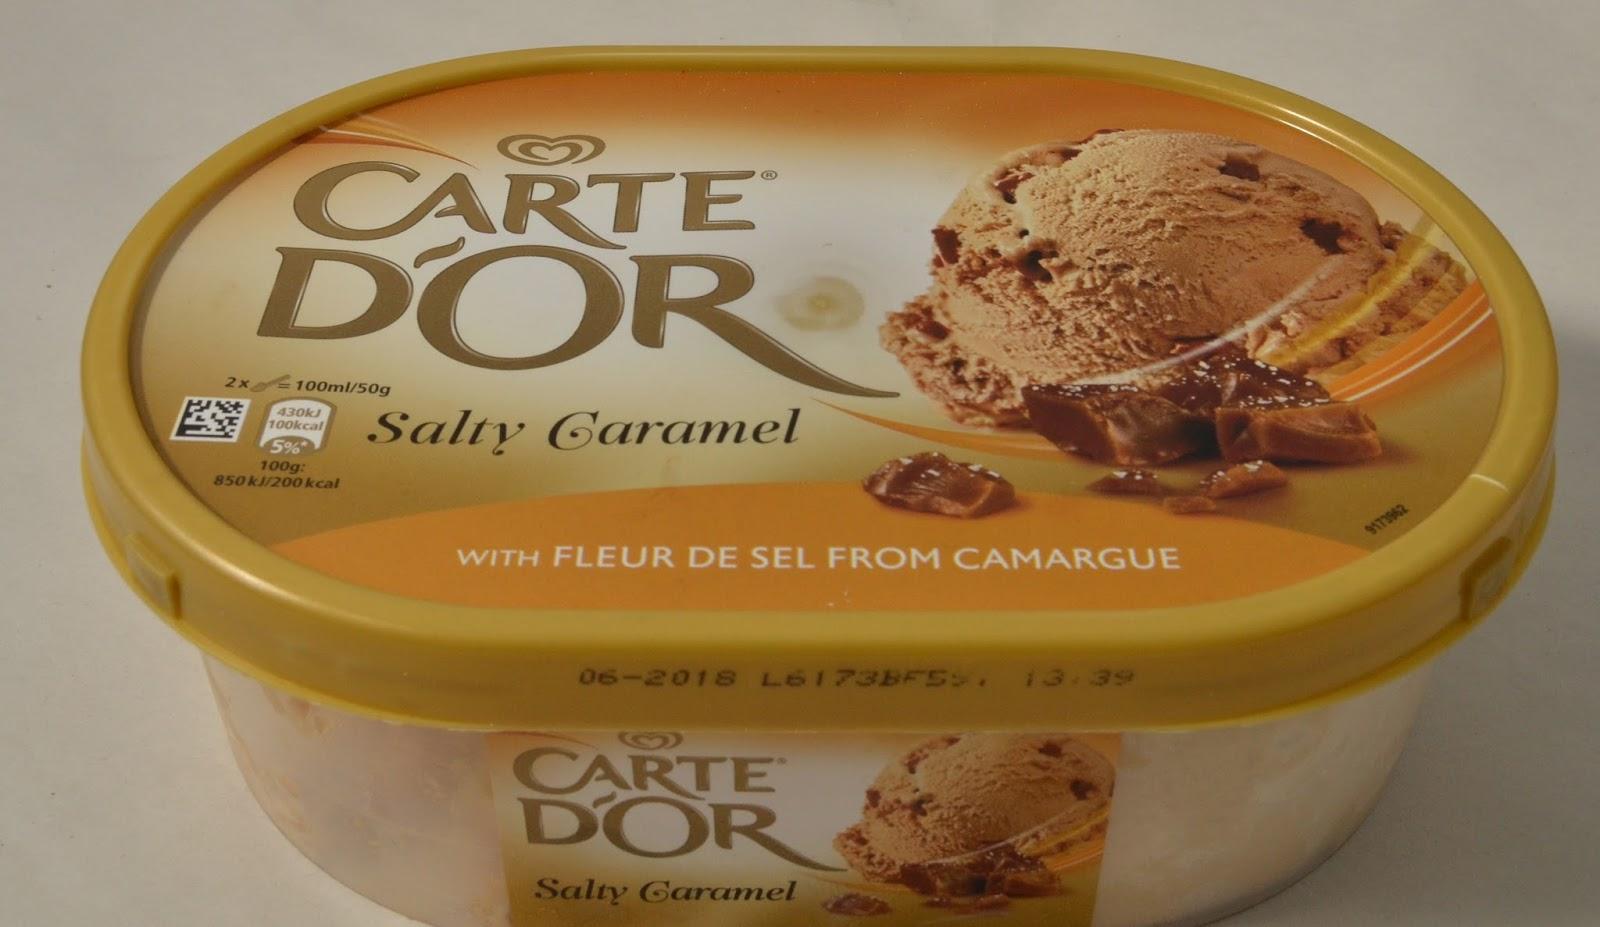 Lody Carte d'Ore w Biedronce 9,99